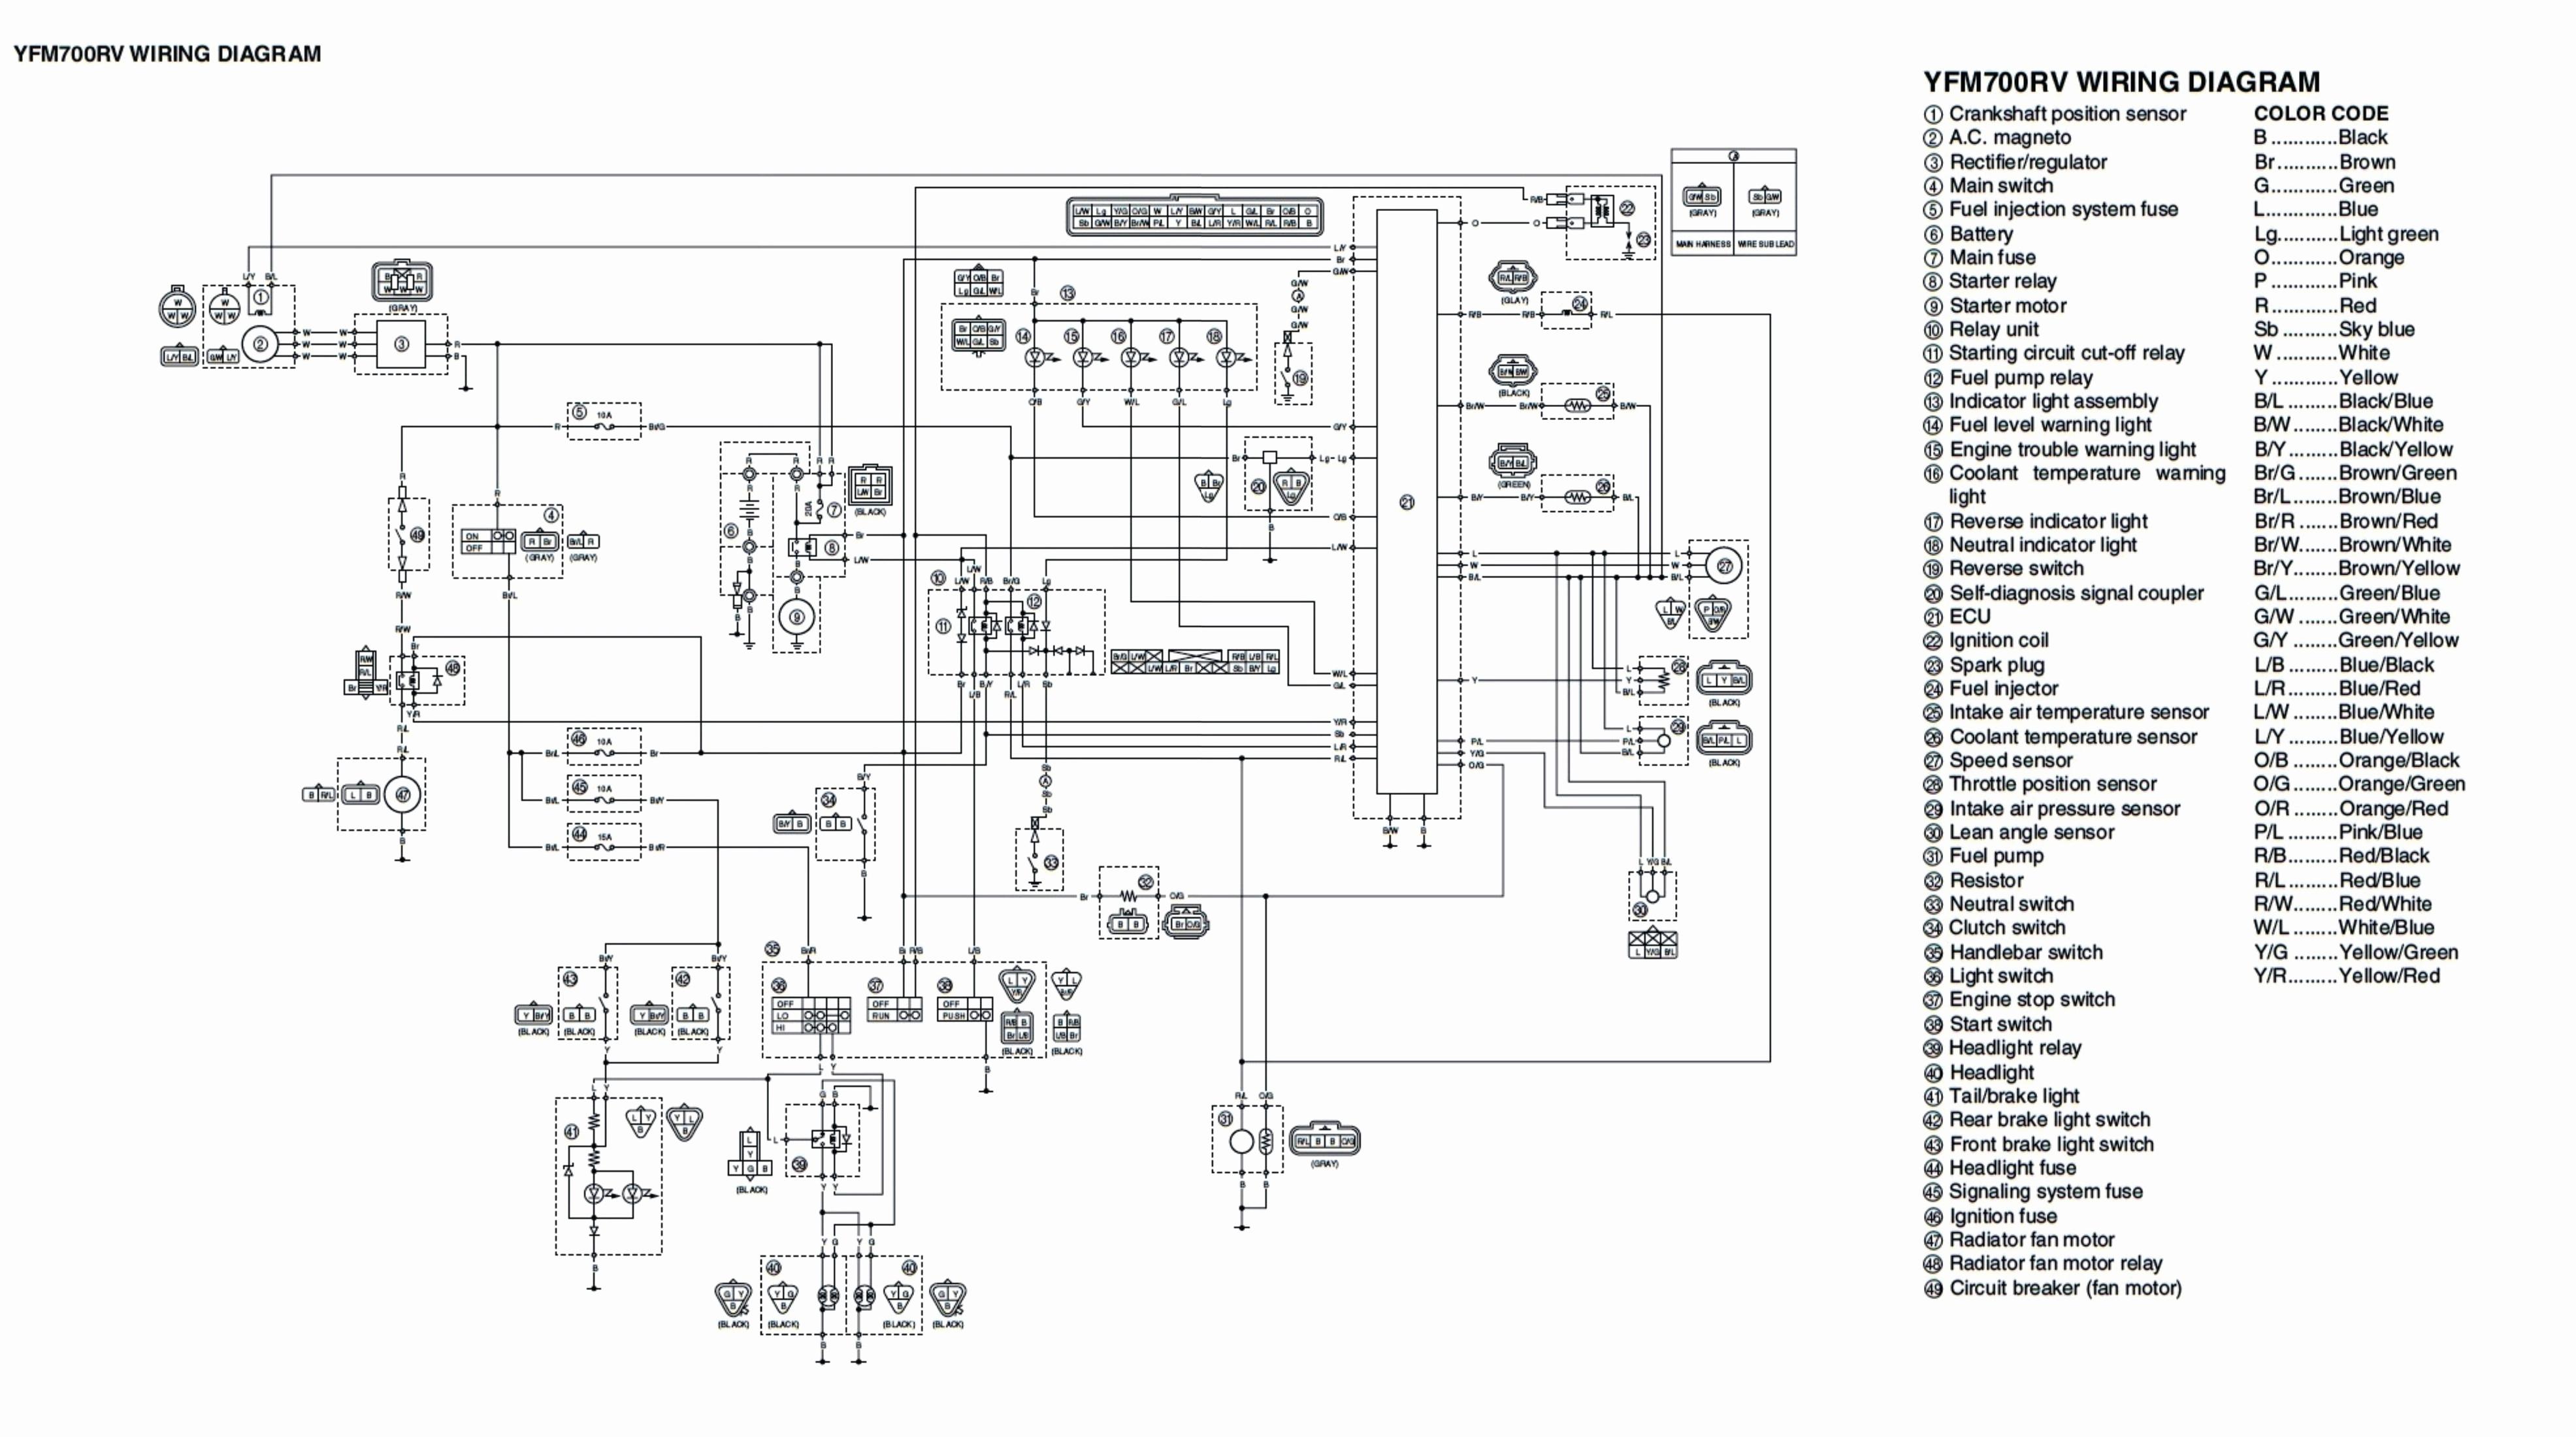 Yamaha 60 Outboard Wiring Diagram Pdf | Wiring Diagram - Yamaha Outboard Wiring Diagram Pdf